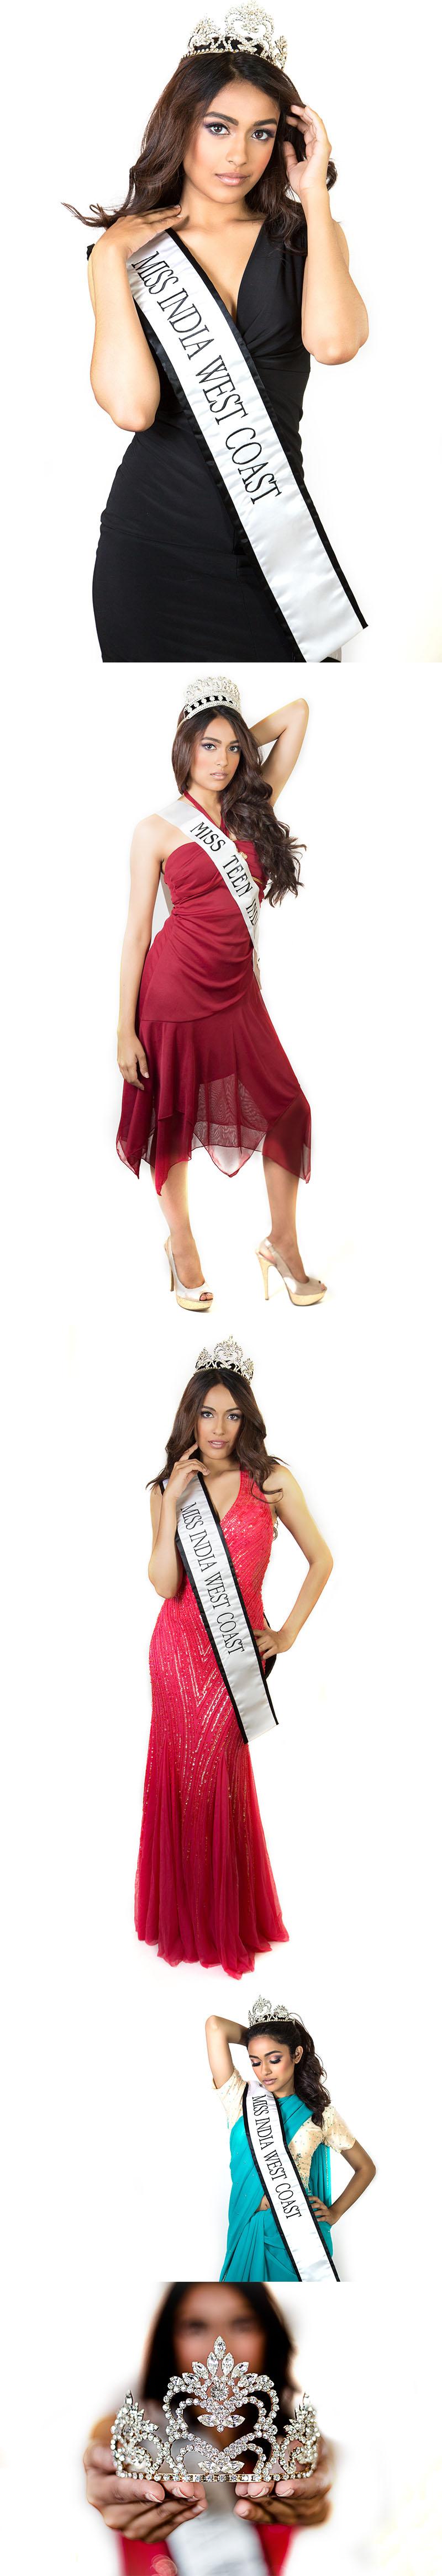 Male and Female model photo shoot of SajanPhotography and Sharmita Bhattacharya